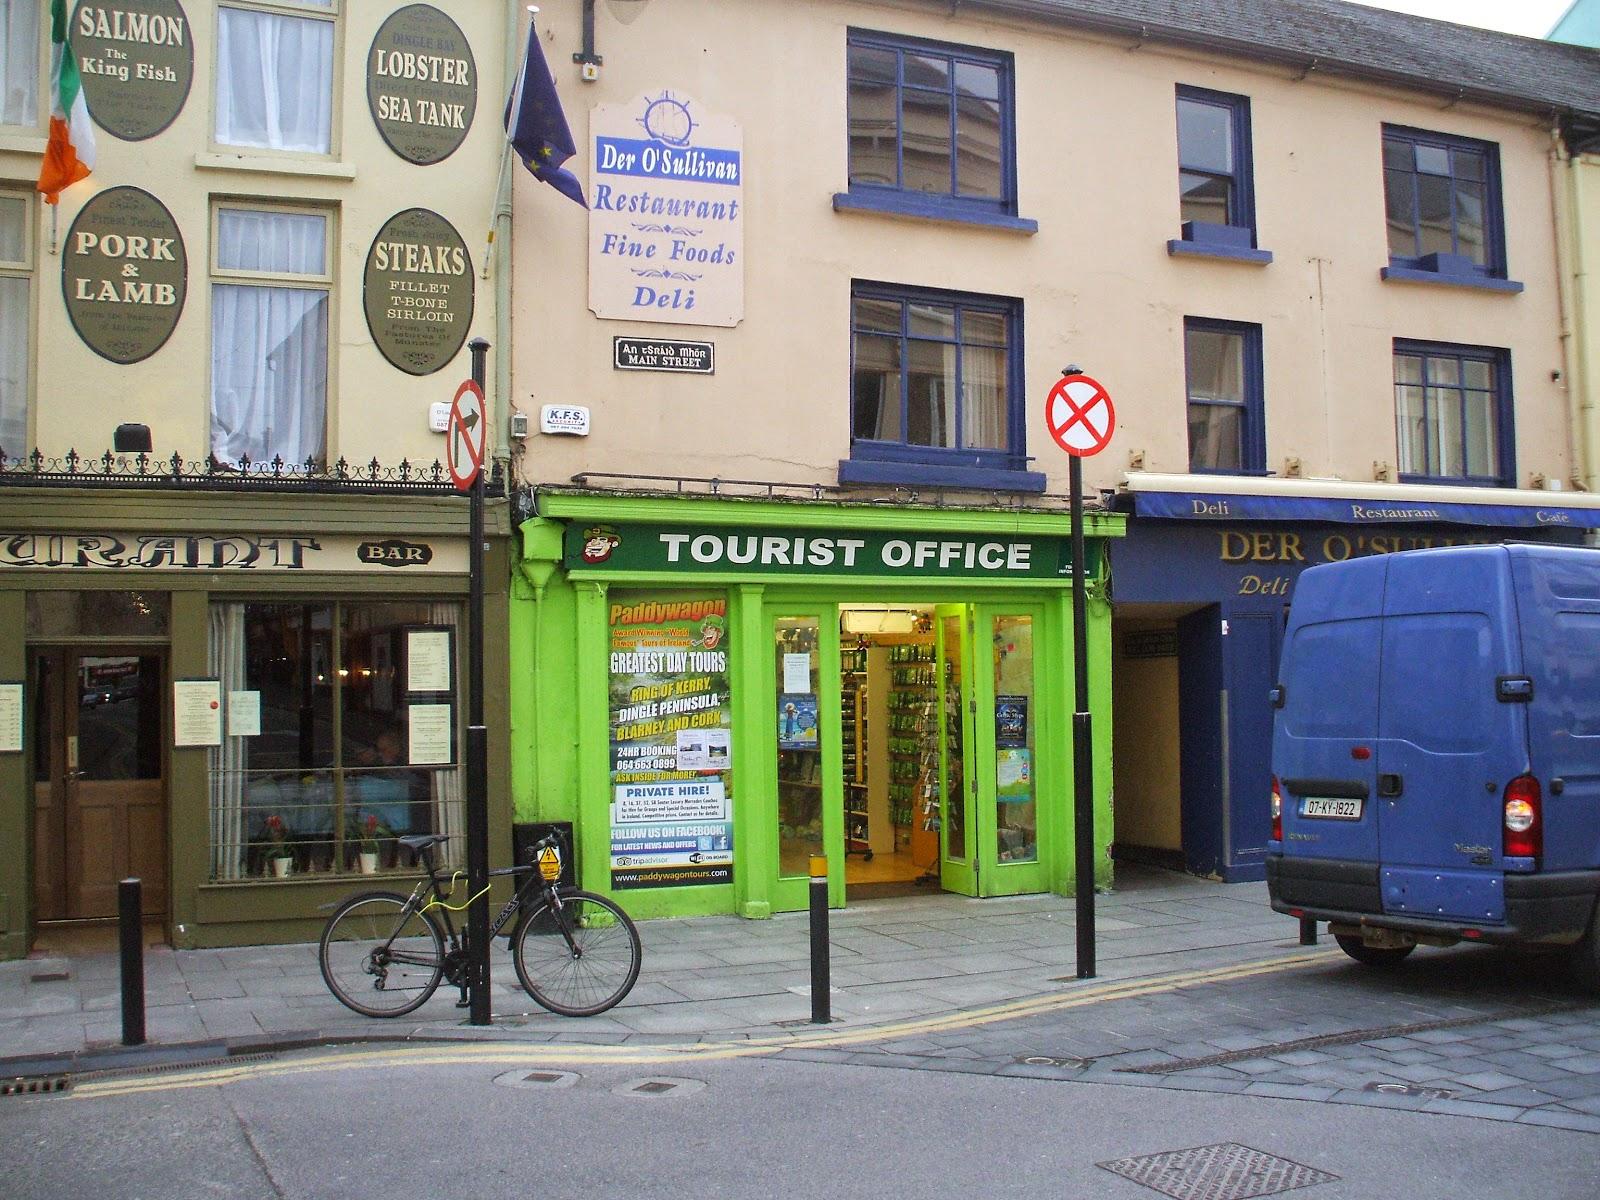 Tourist office - Office tourisme killarney ...